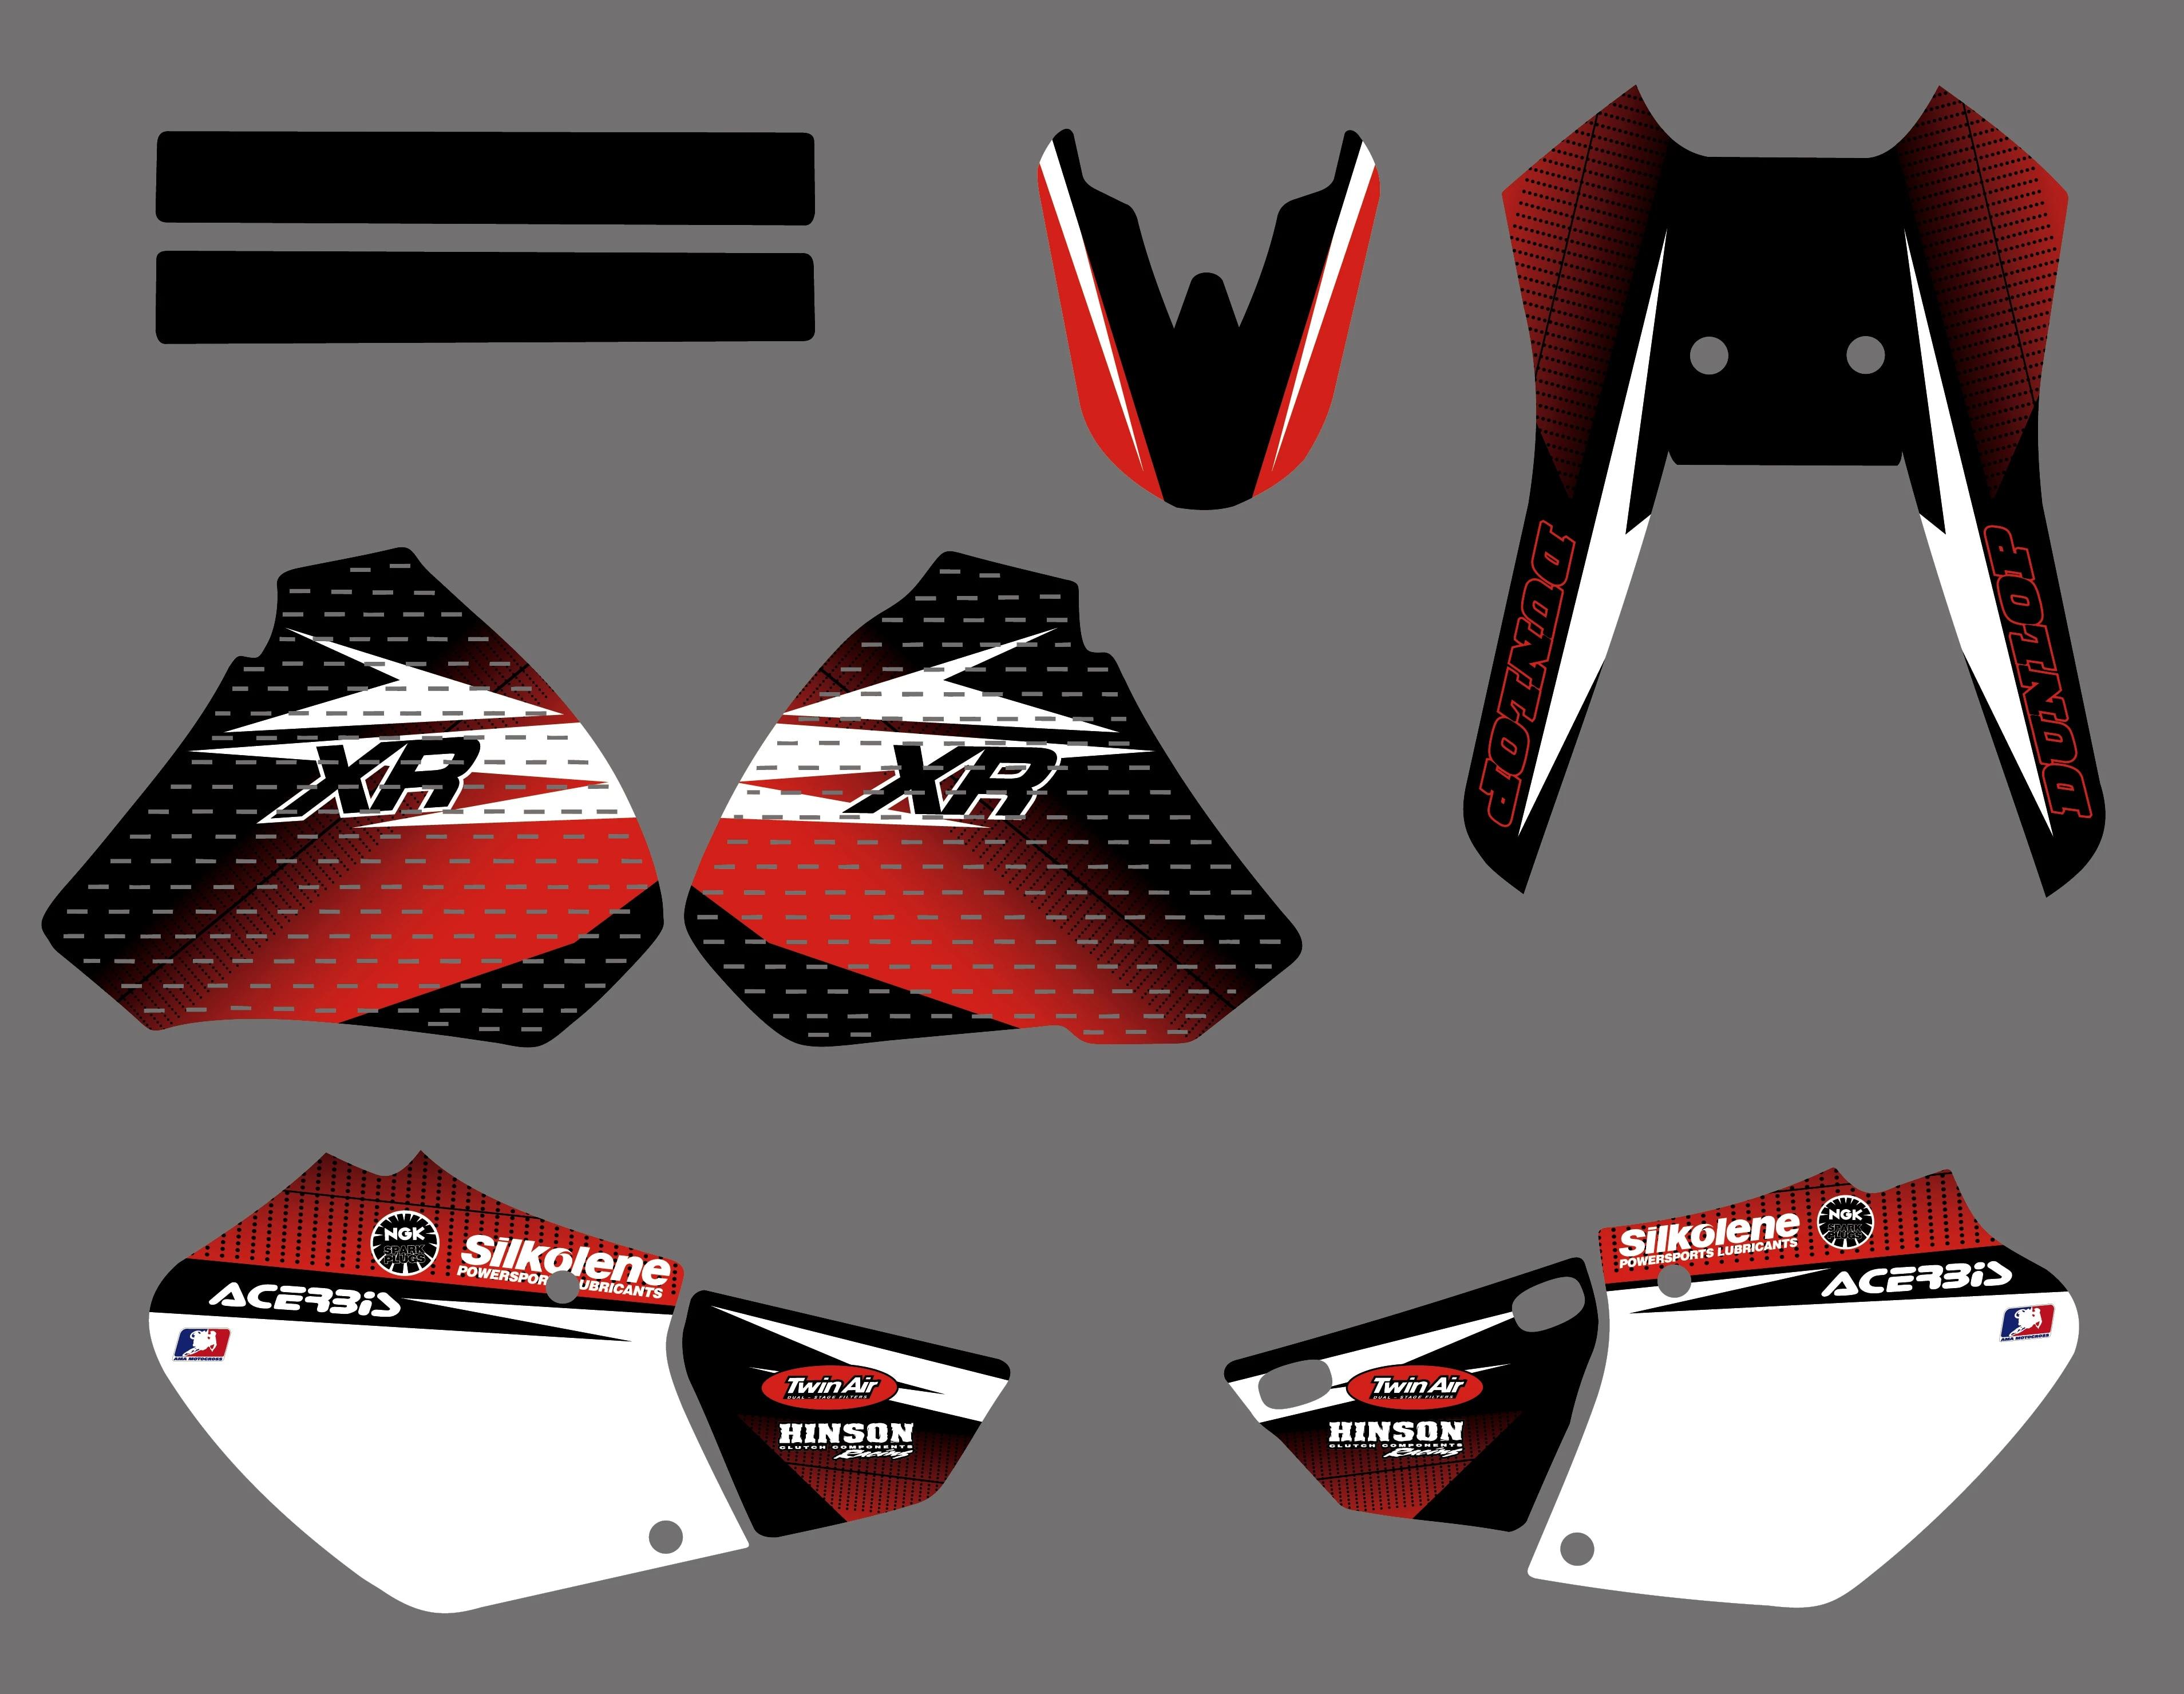 Honda XR400R 1996 1997 1998 1999 2000 2001 2002 2003 2004 Sticker Kit Graphics